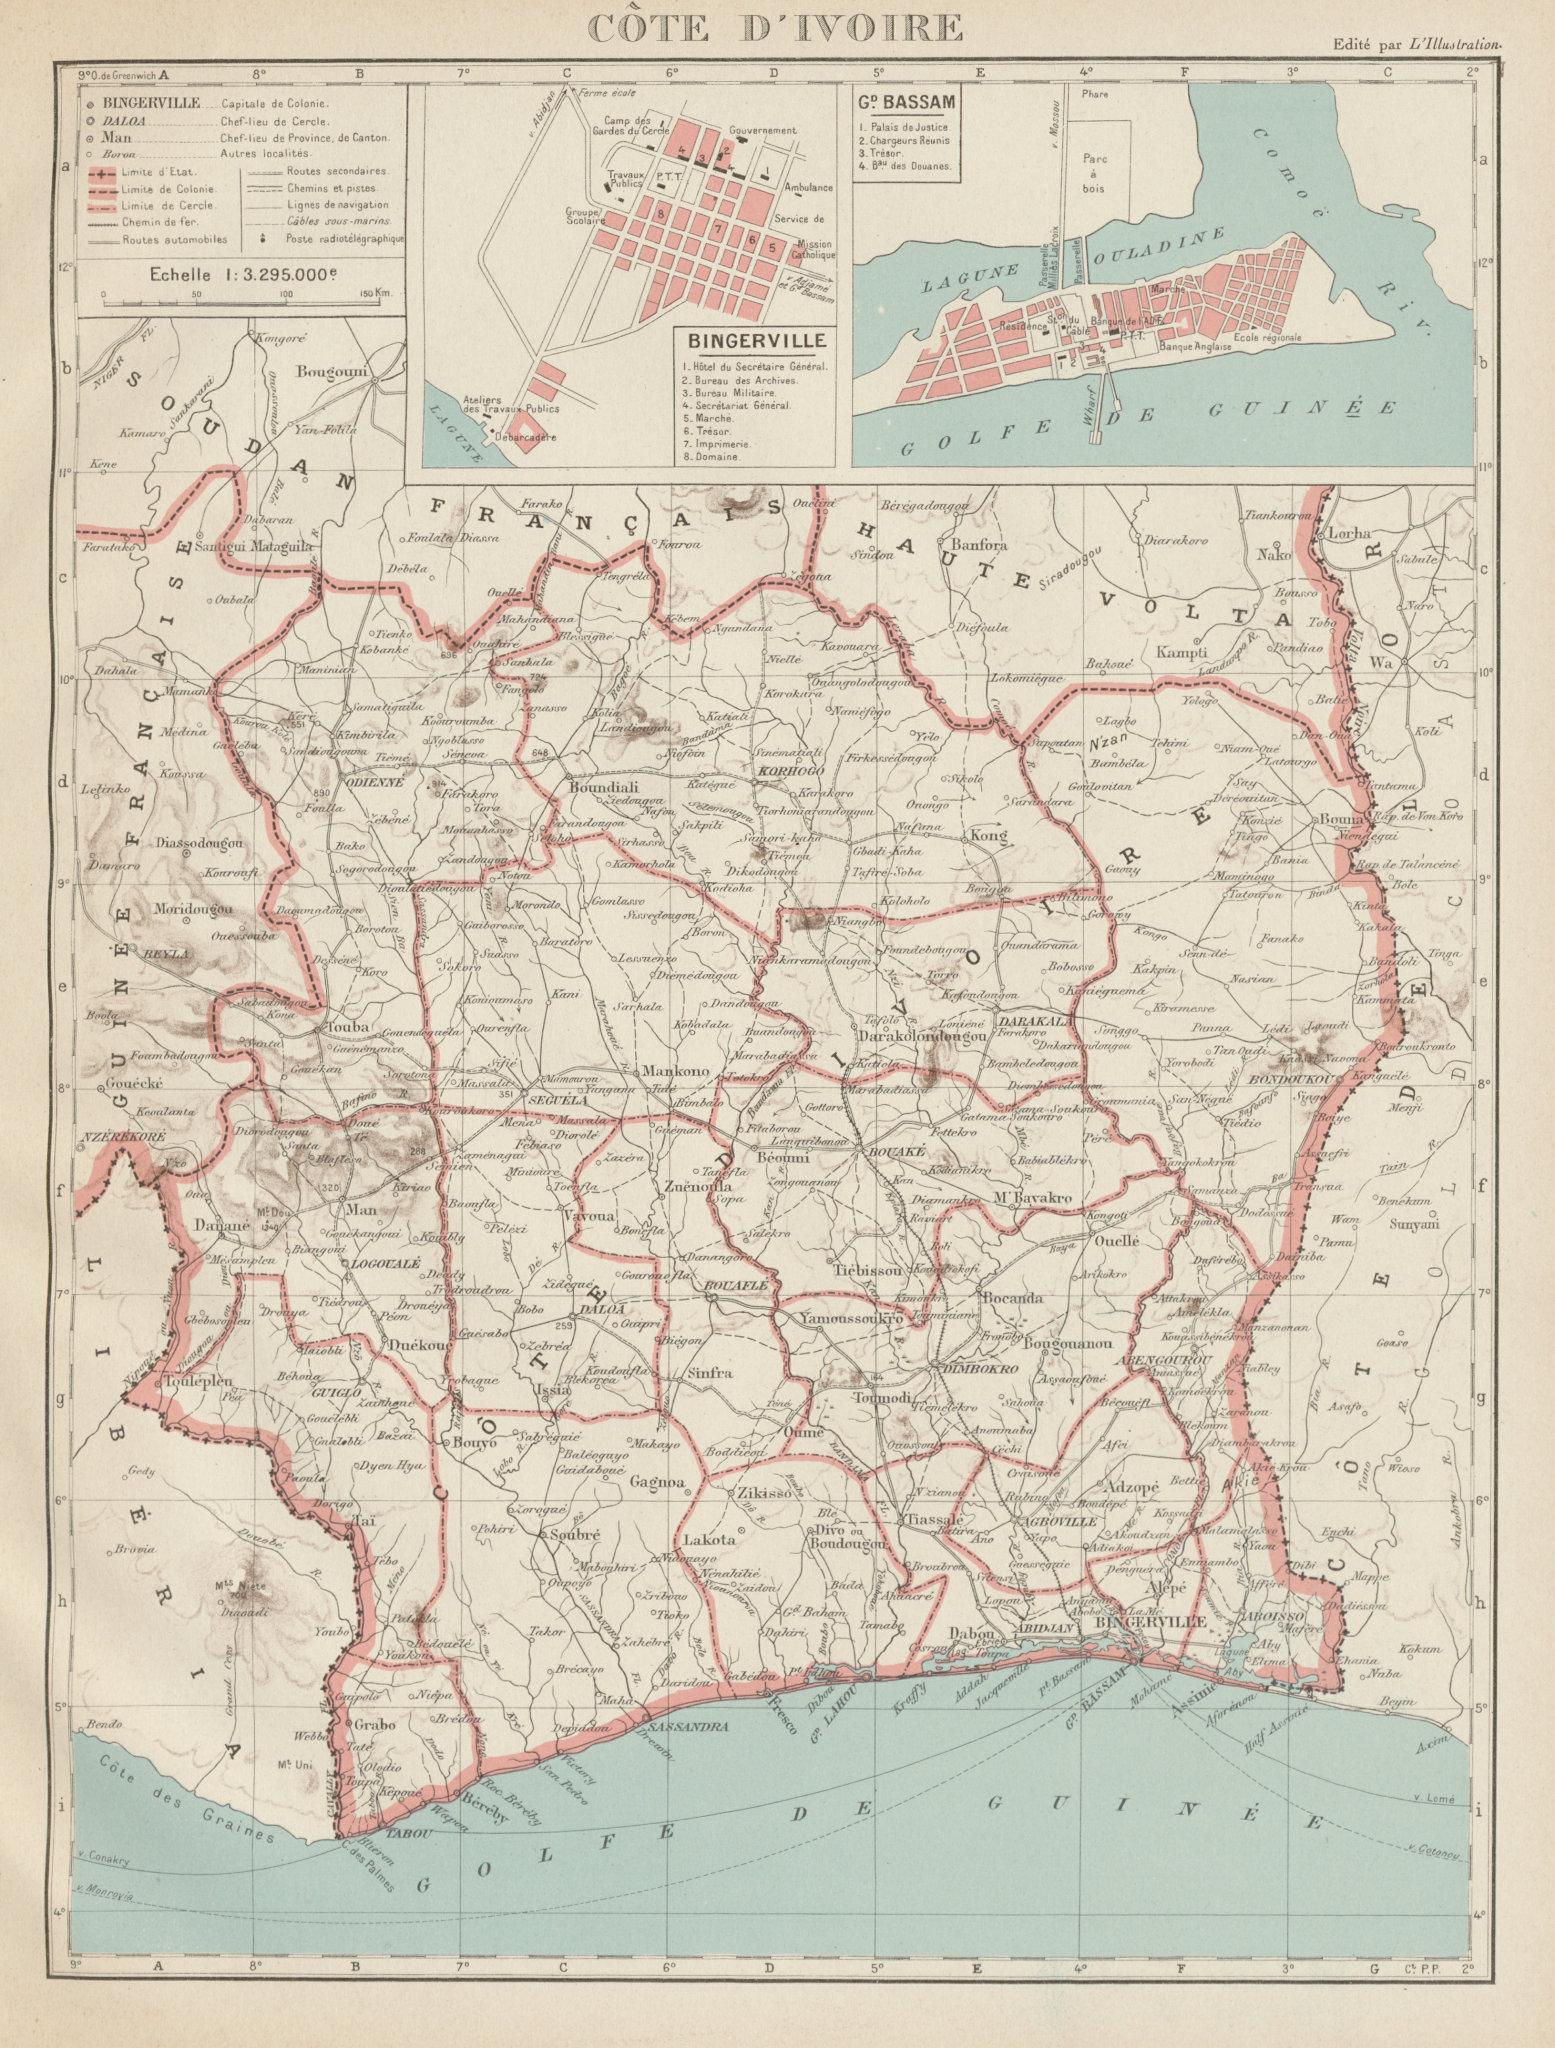 Associate Product IVORY COAST Côte d'Ivoire. Bingerville (Abidjan) Grand Bassam city plan 1929 map